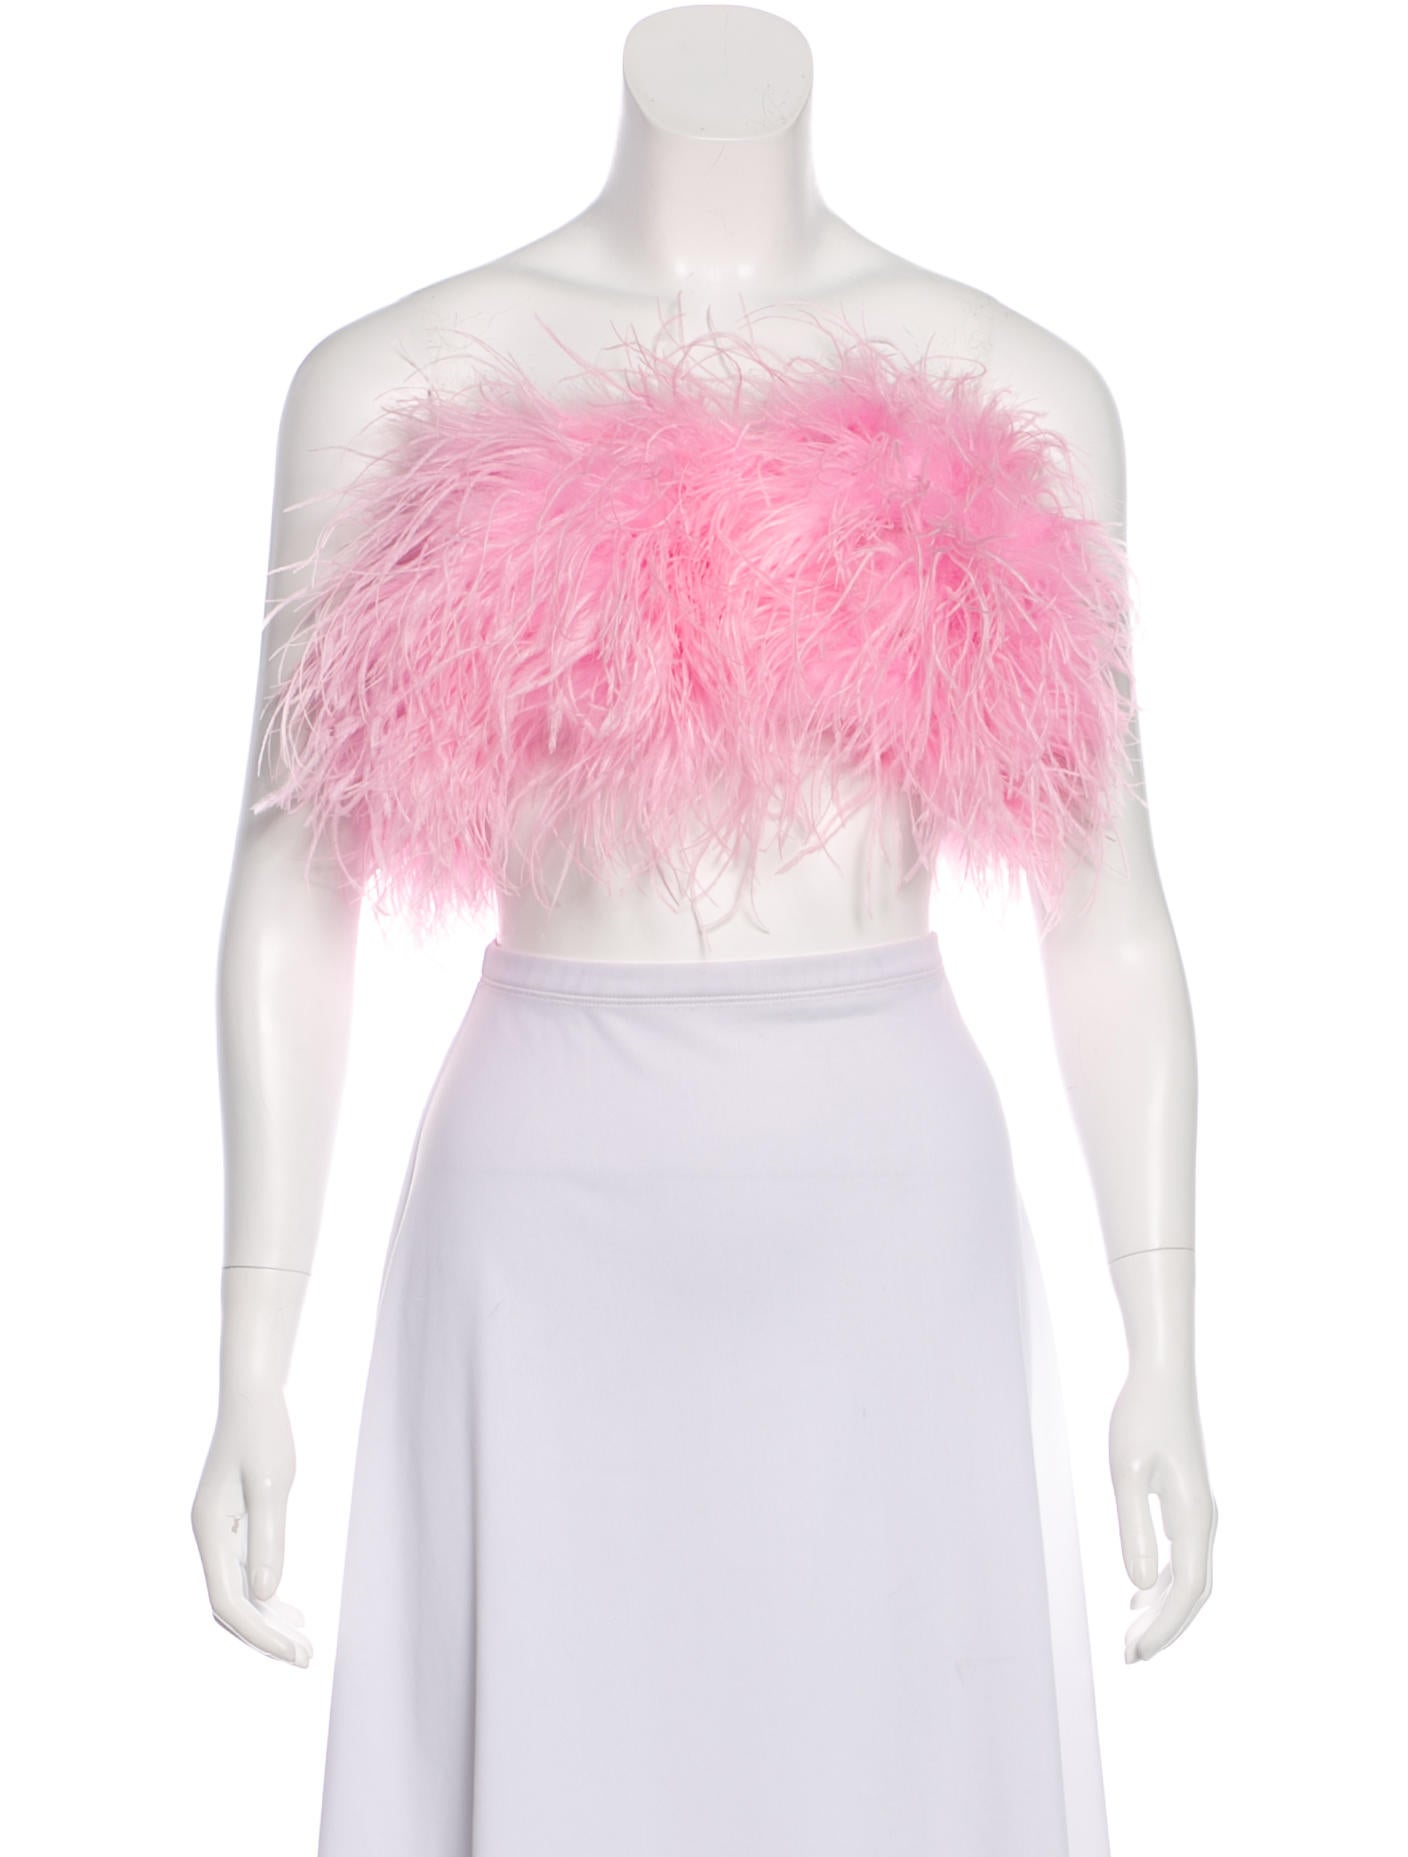 b4efc2adfc Adam Selman 2018 Ostrich Feather Bandeau Top - Clothing - WADMS20192 ...